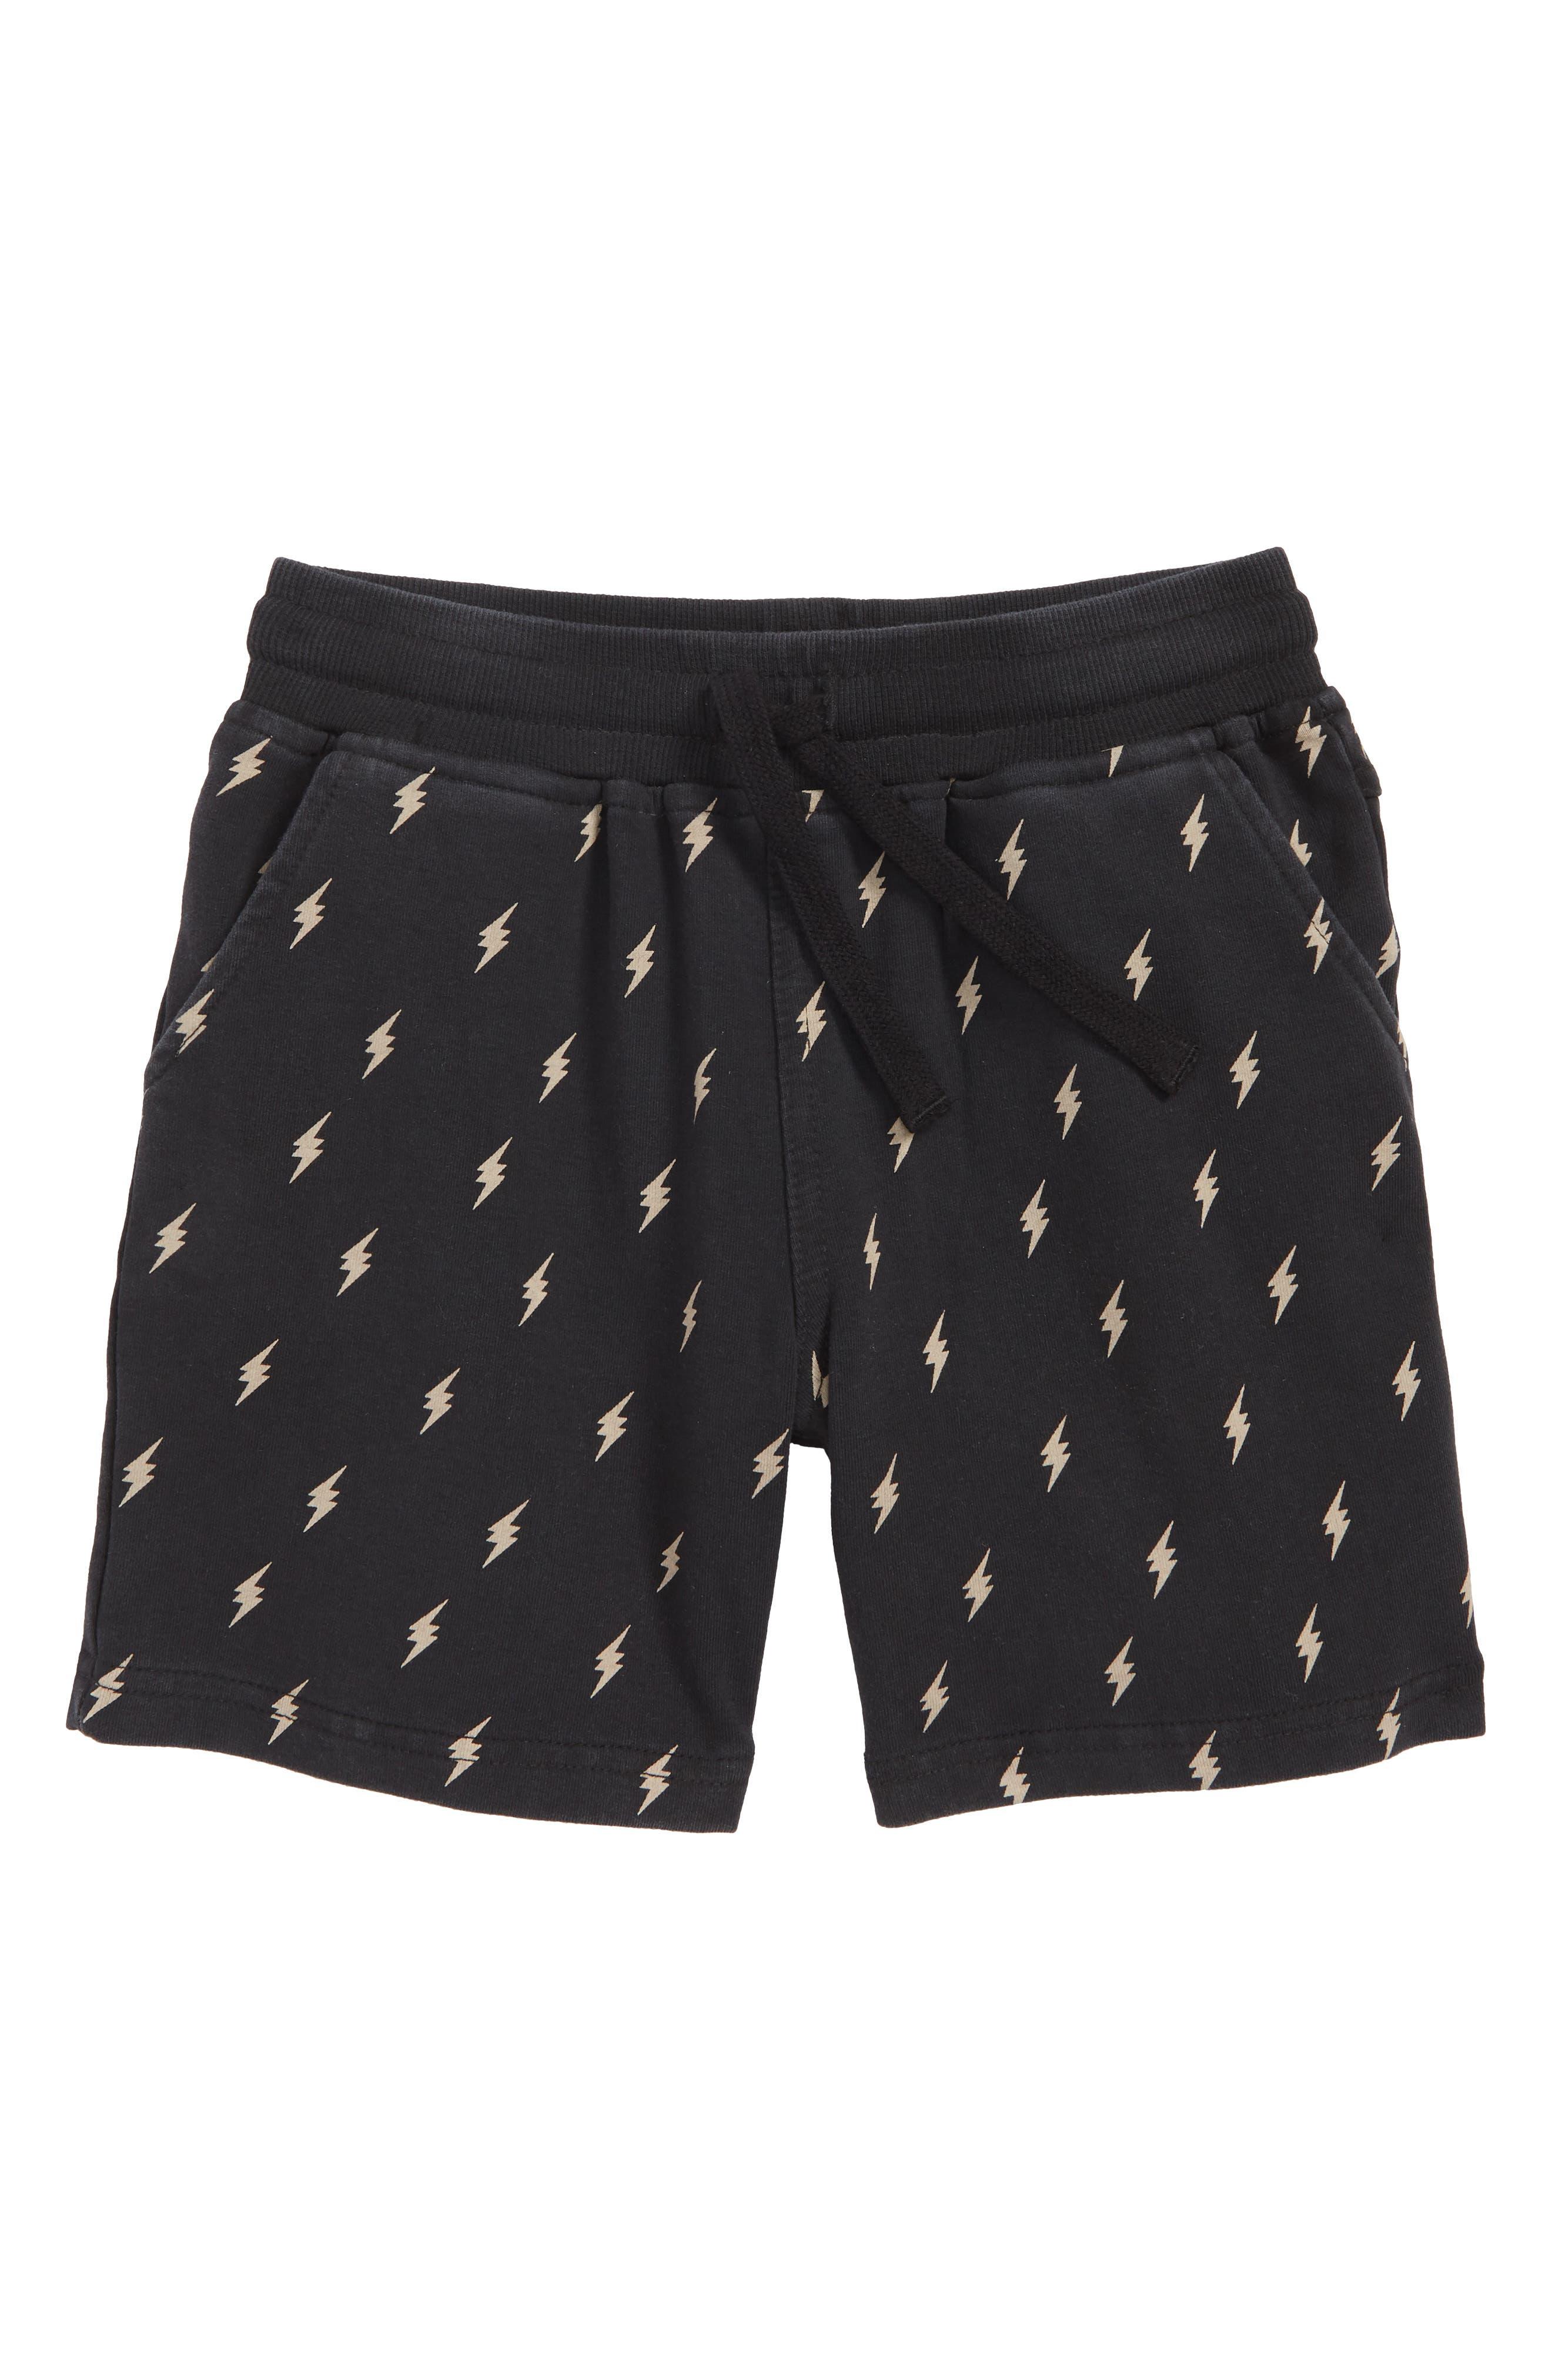 Thunderstruck Jogger Pants,                         Main,                         color,